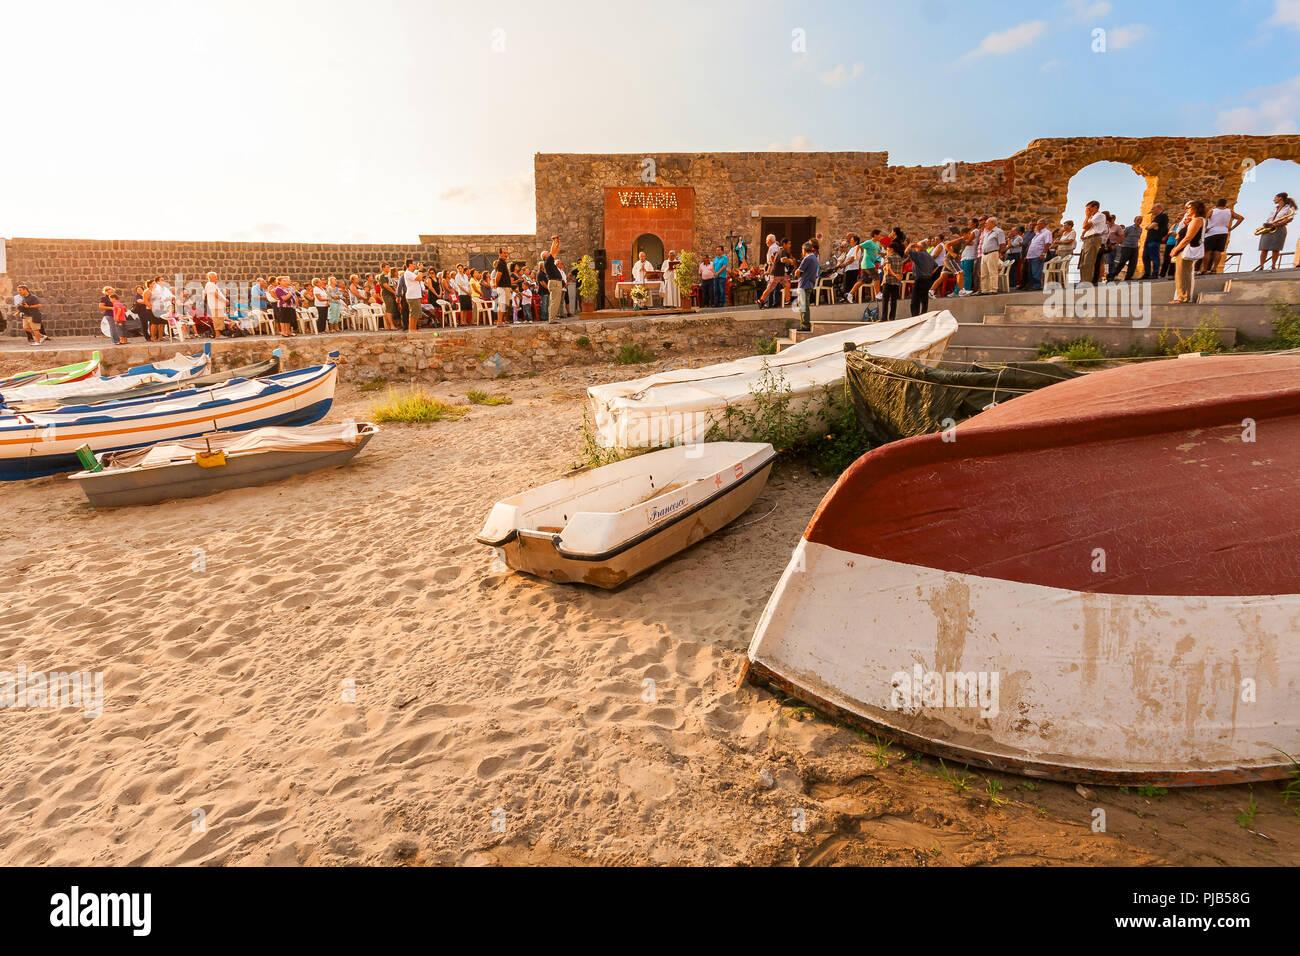 CEFALU / SICILY - SEPTEMBER 15, 2011: Catholic mess at the beach, shot taken at dusk after sunset - Stock Image